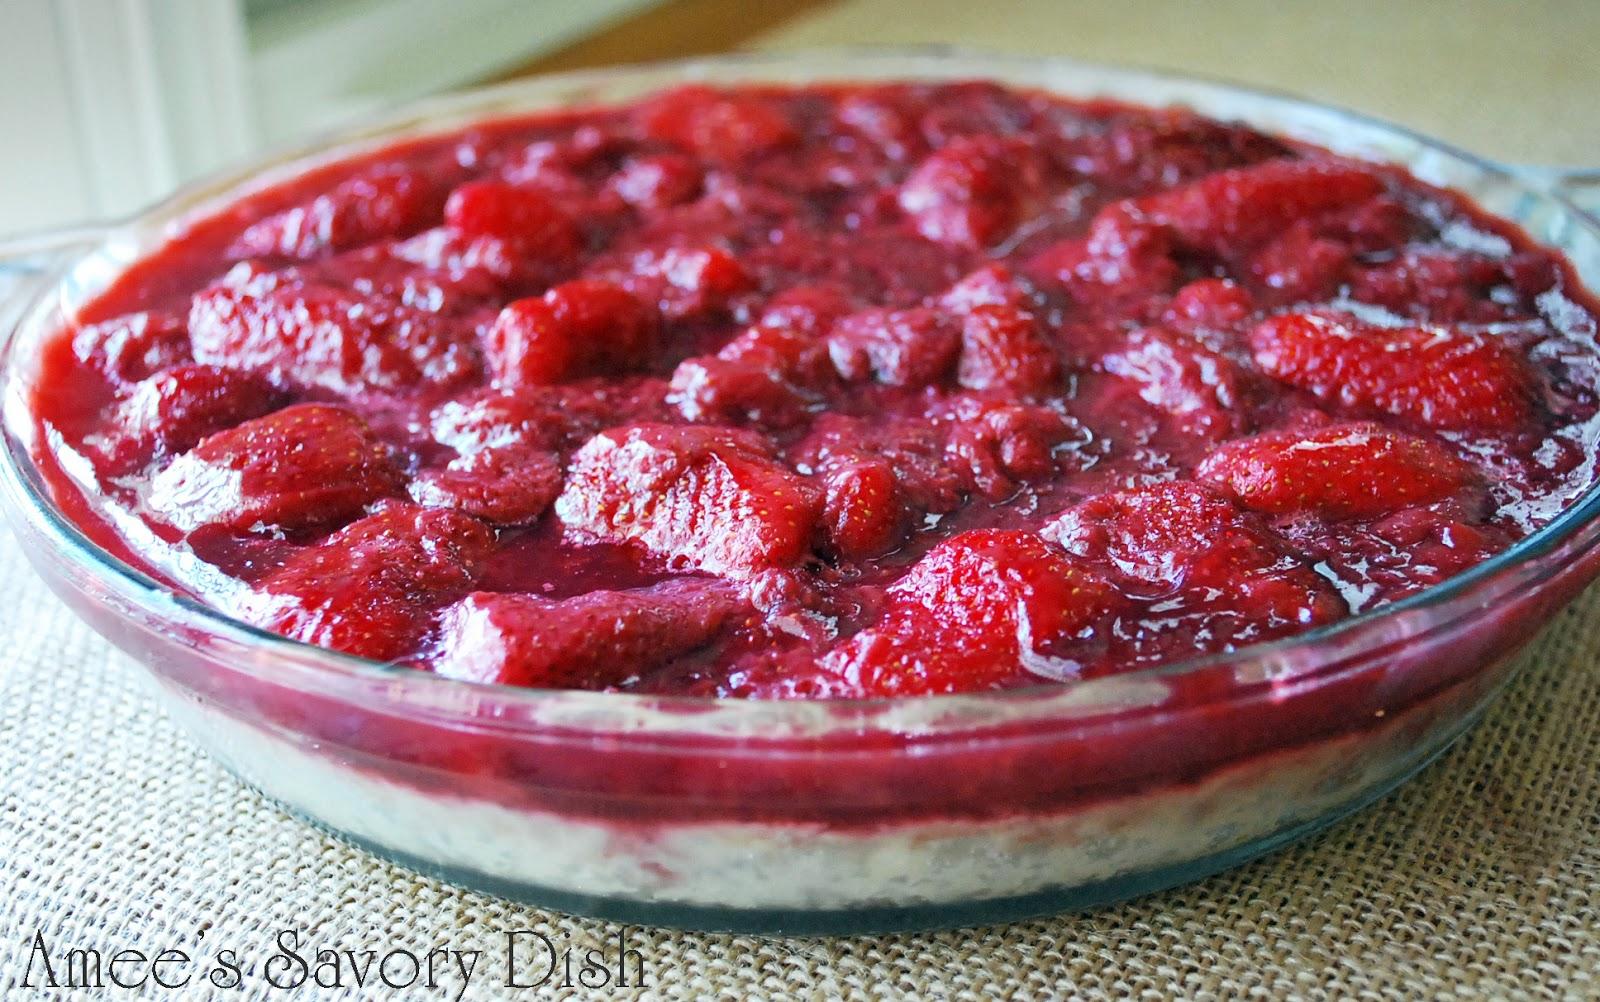 Fresh Strawberry Pie with Grain-Free Crust - Amee's Savory Dish